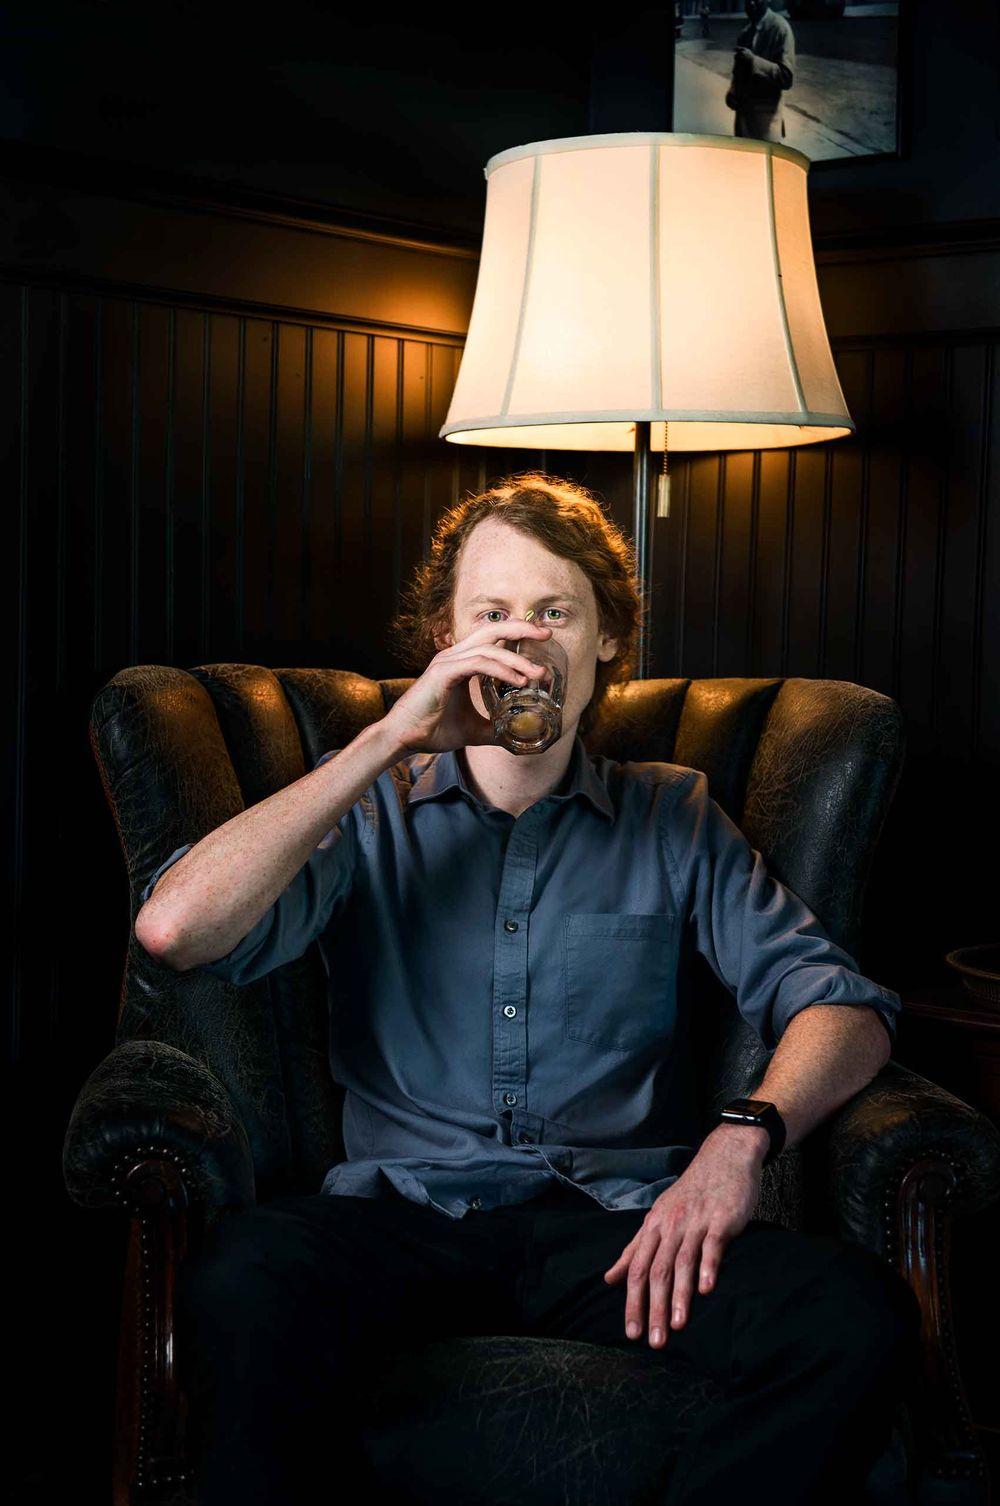 Man-drinking-cocktail-in-clubchair-TimCaffin-by-HenrikOlundPhotography.jpg